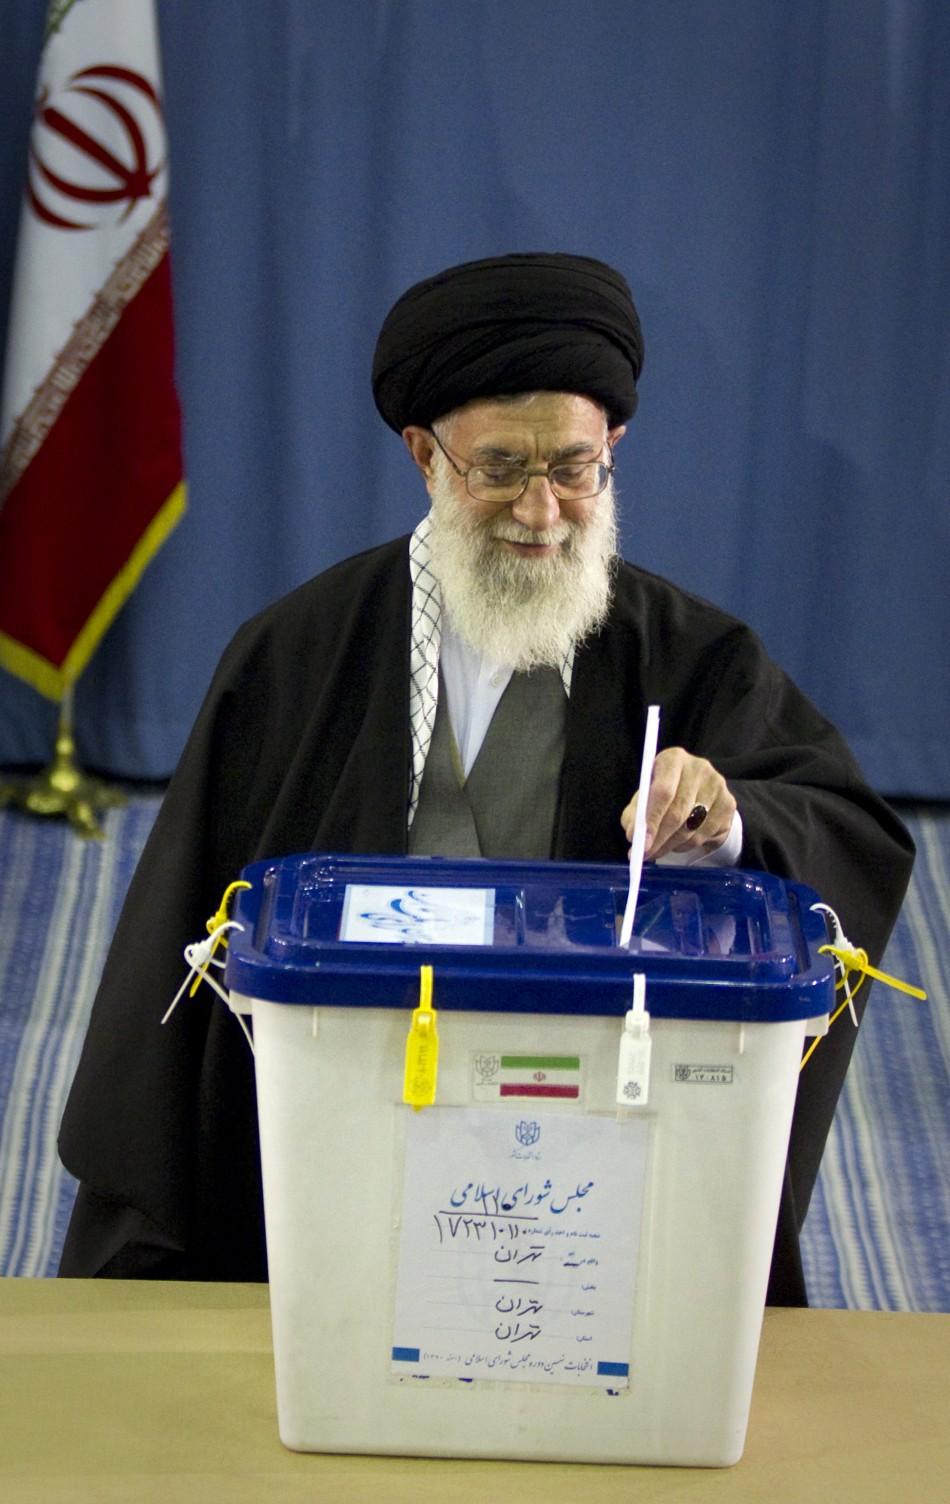 Ayatollah Ali Khamenei votes parliamentary elections in Tehran